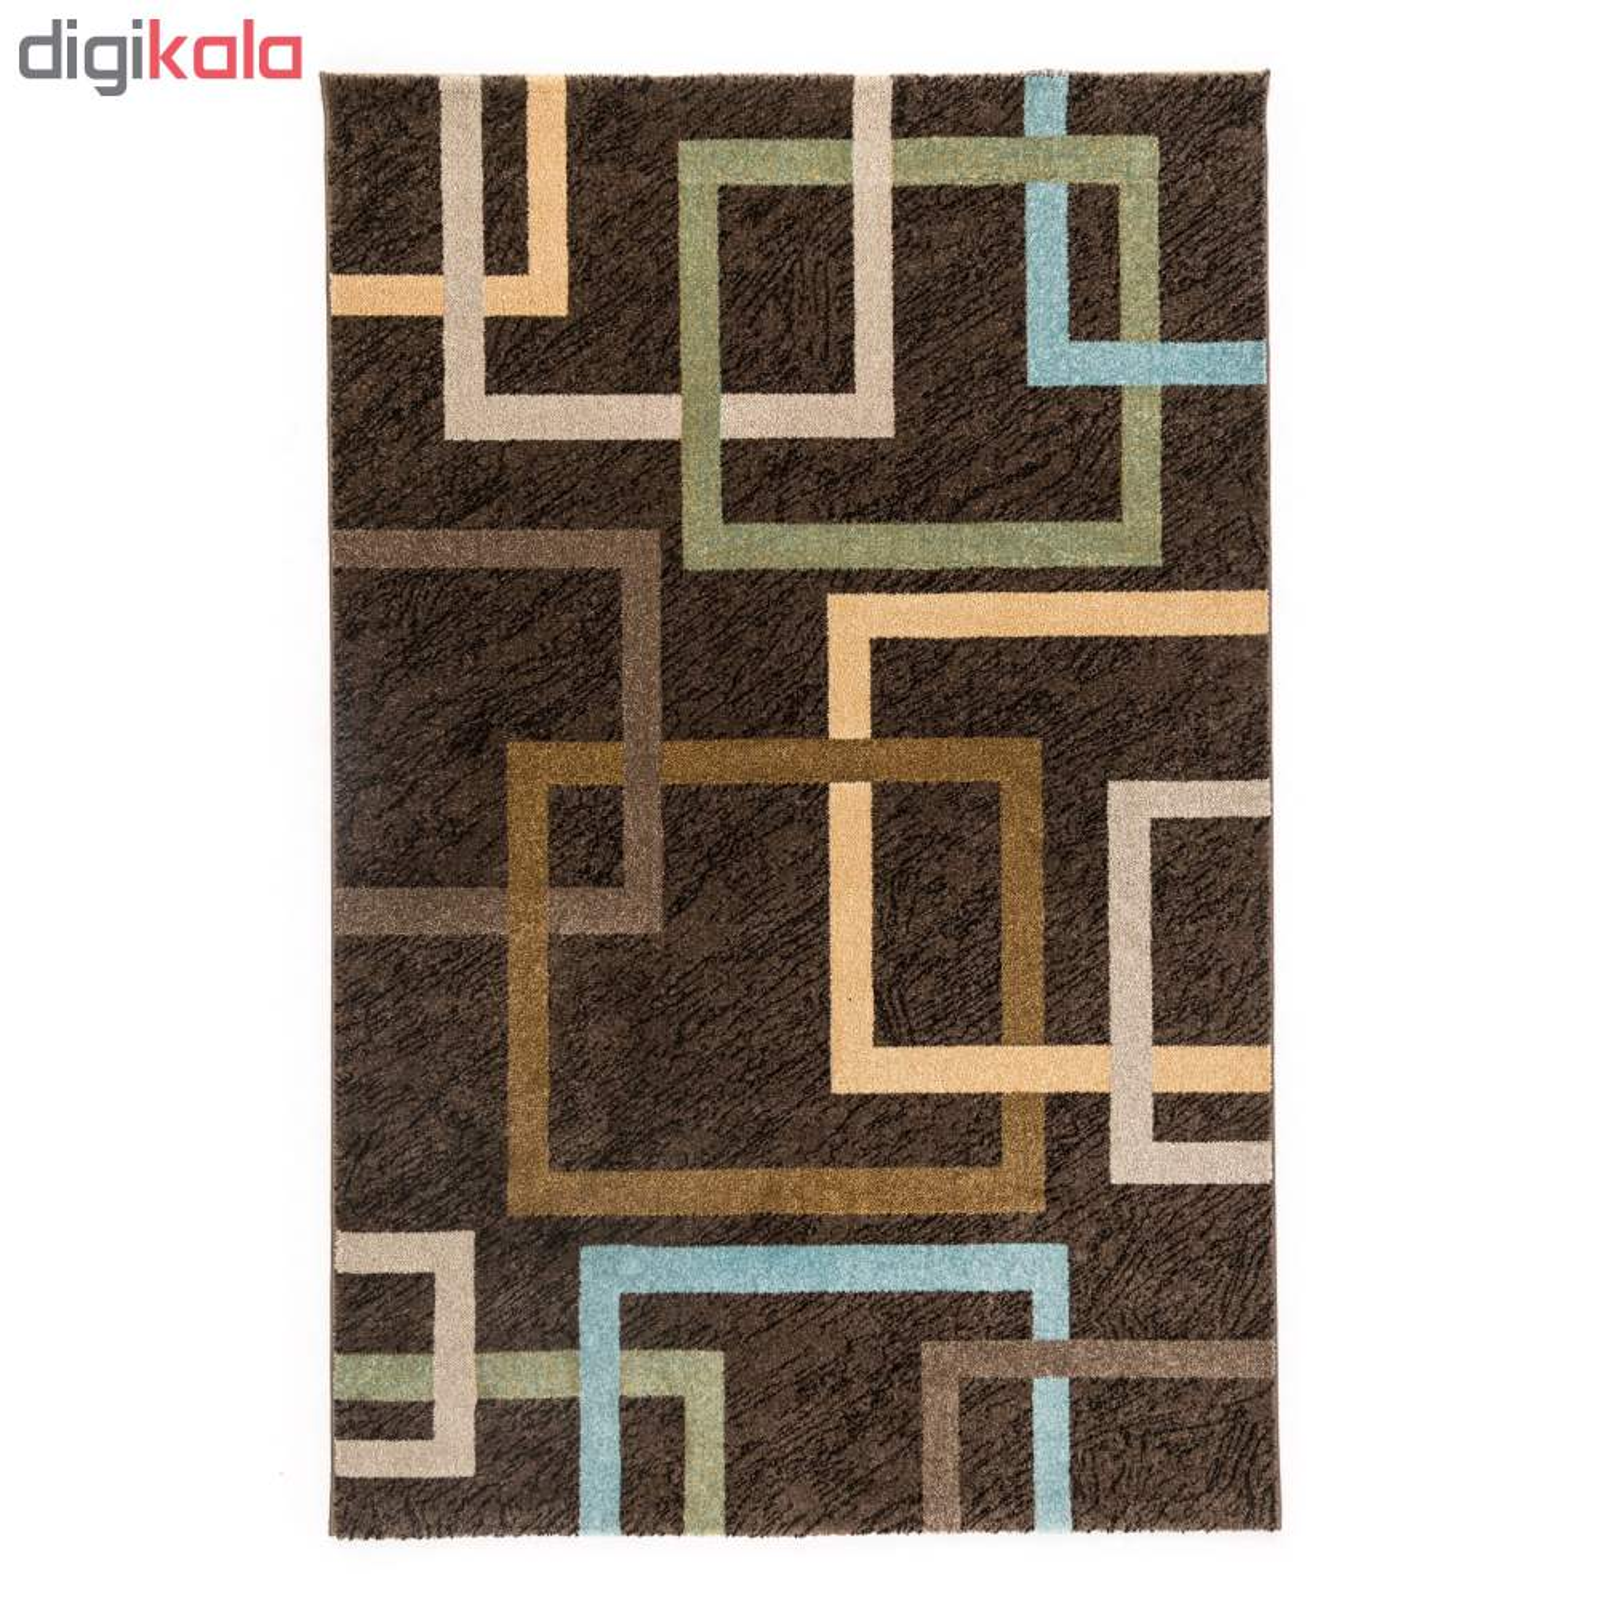 فرش ماشینی ساوین طرح ۴۰۰۳ زمینه نسکافه ای main 1 1